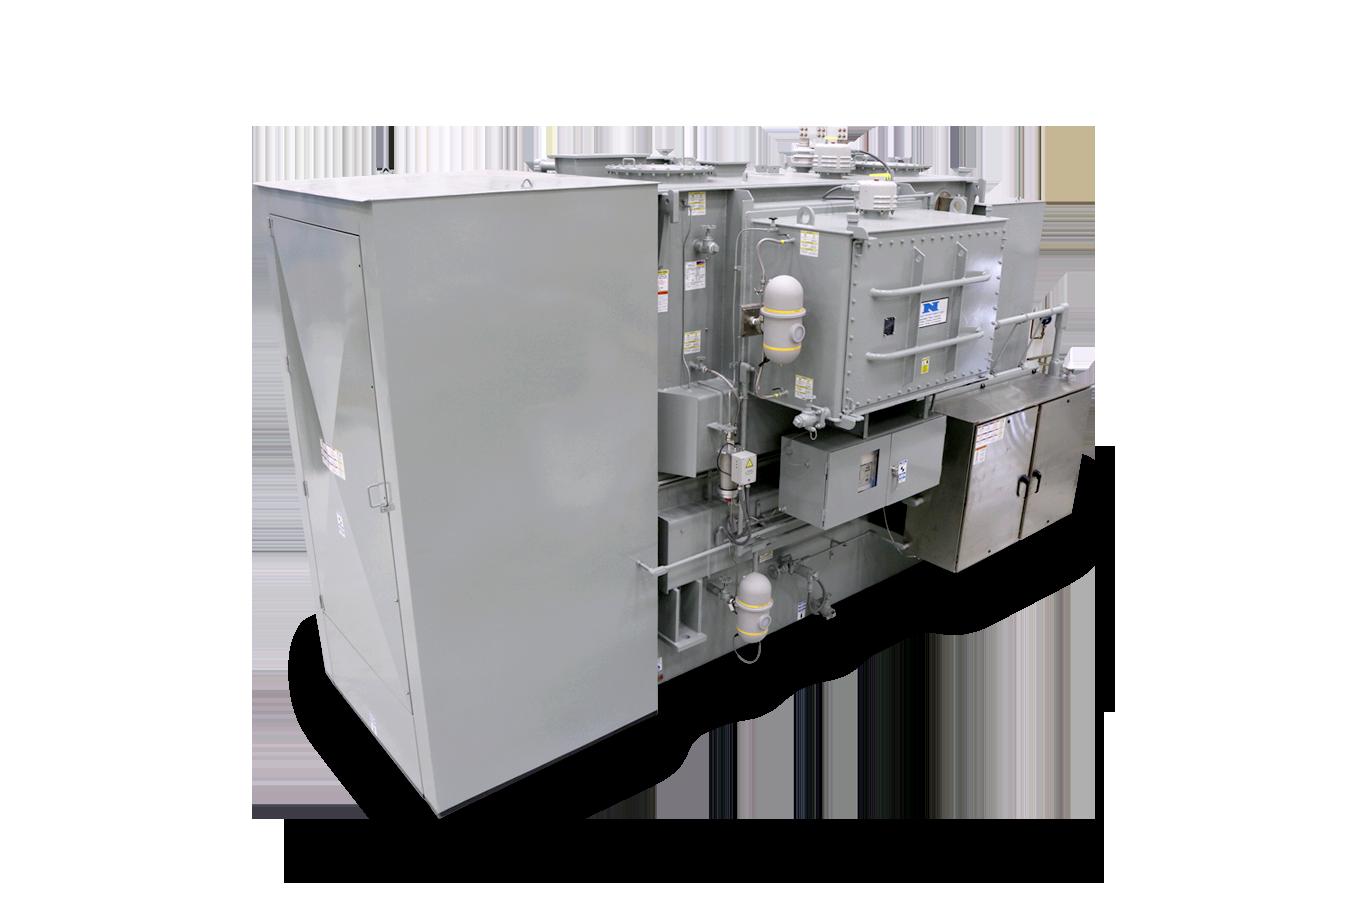 Process High Current Rectifier Duty Transformers - Niagara Transformer